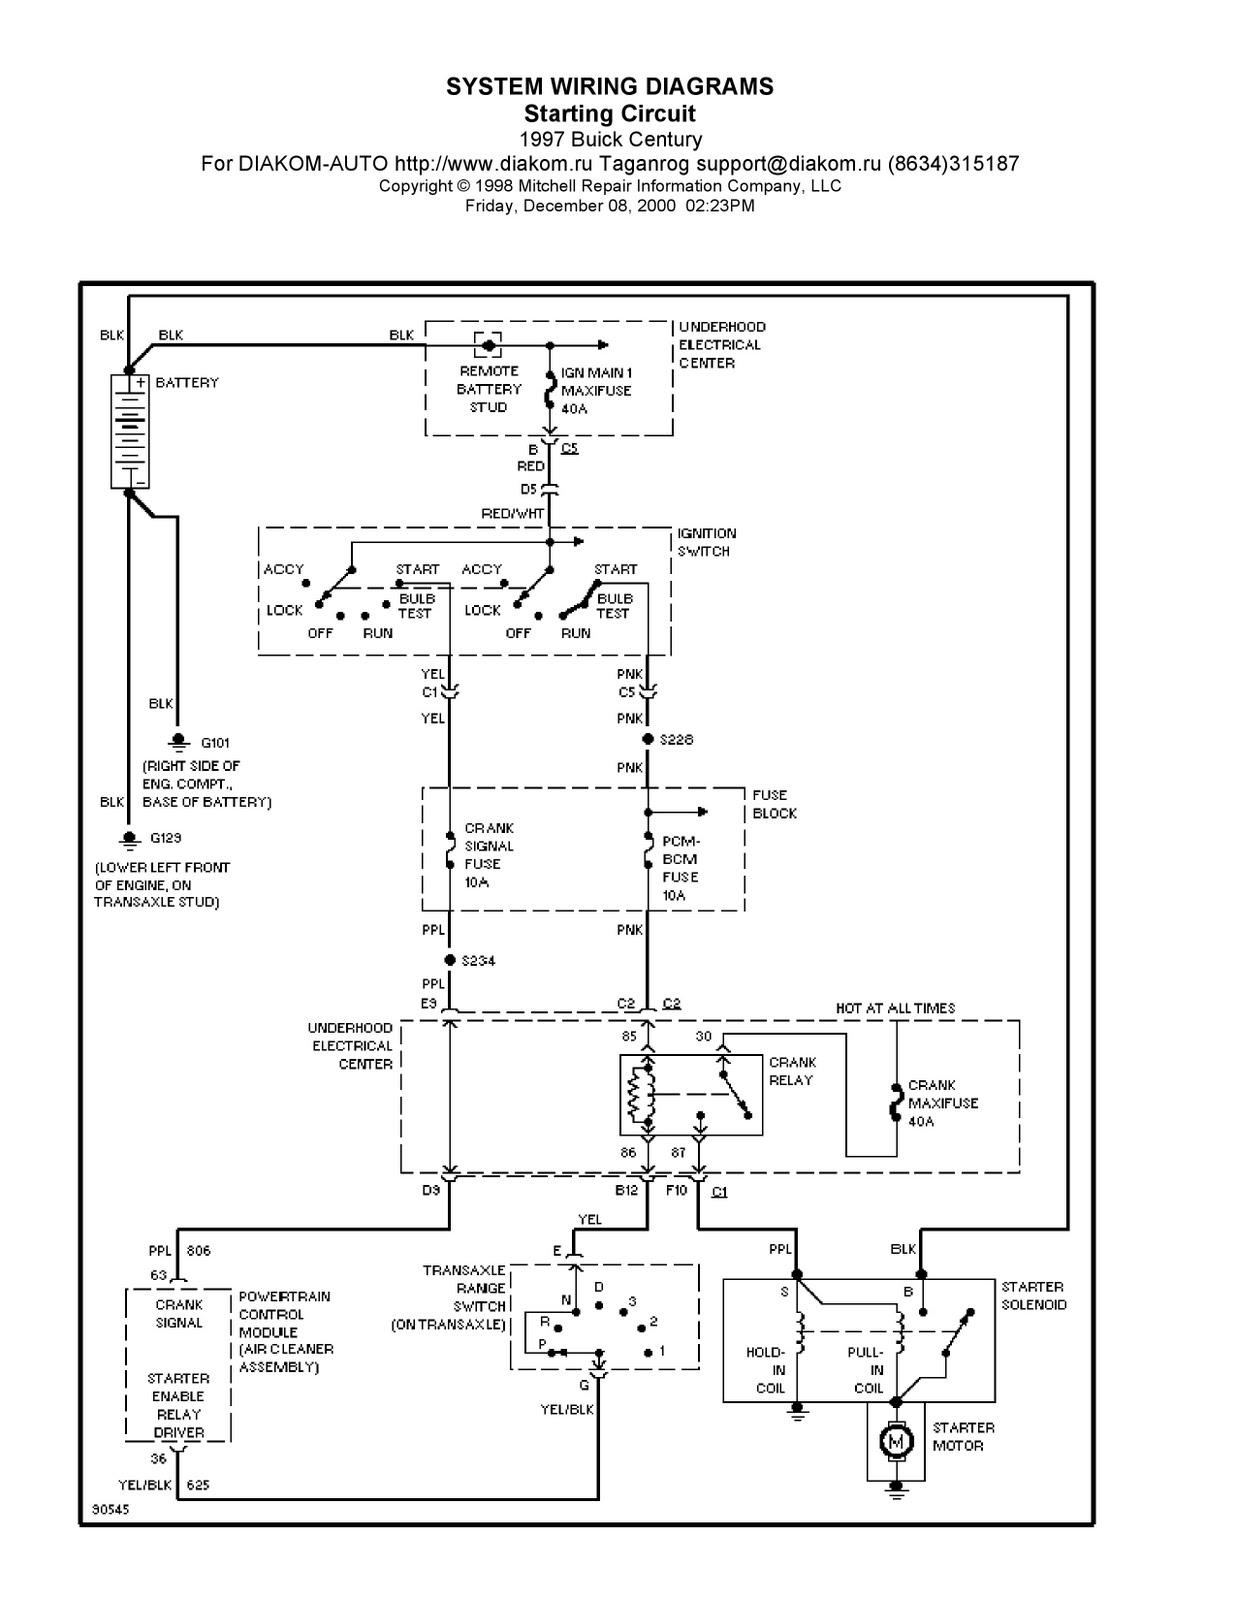 95 Buick Roadmaster Fuse Box Diagram Get Free Image 1993 For 1991 Park Avenue